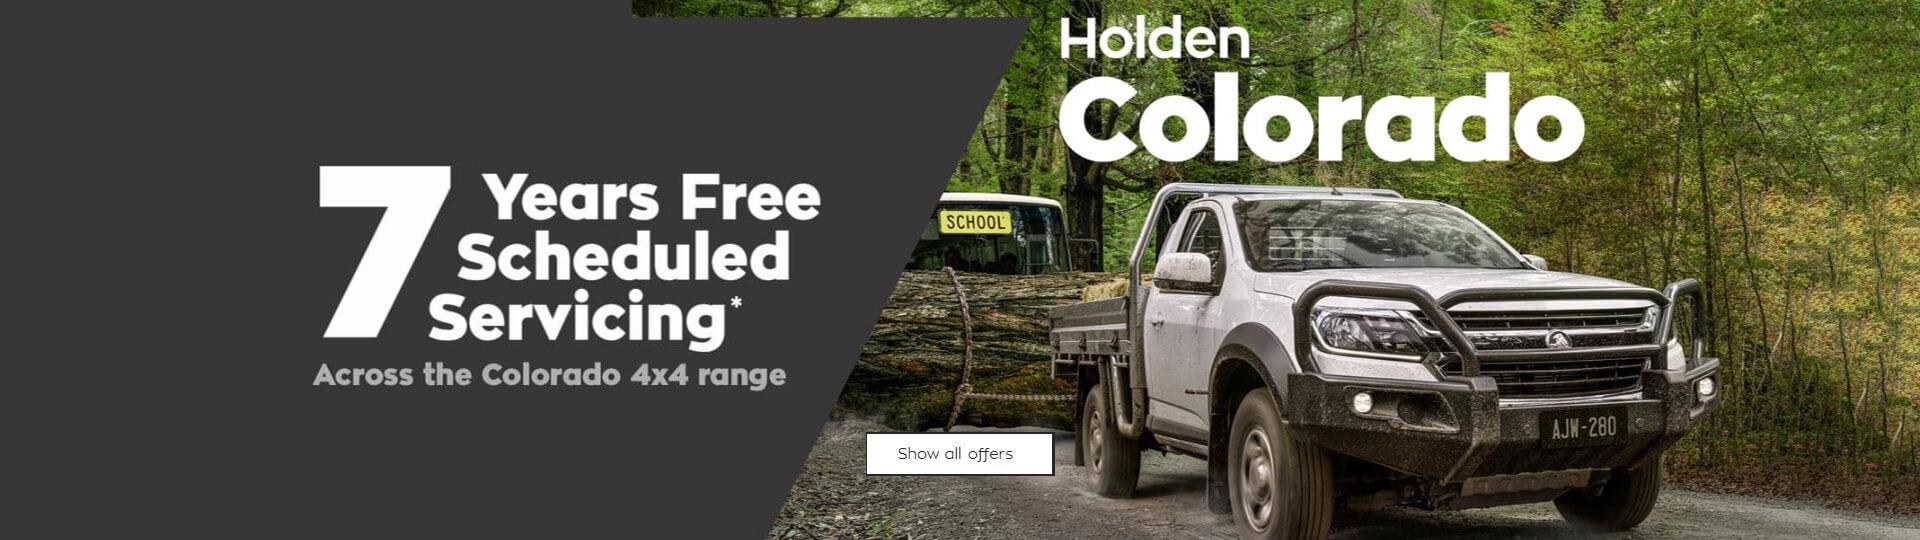 2019 October Holden Offer